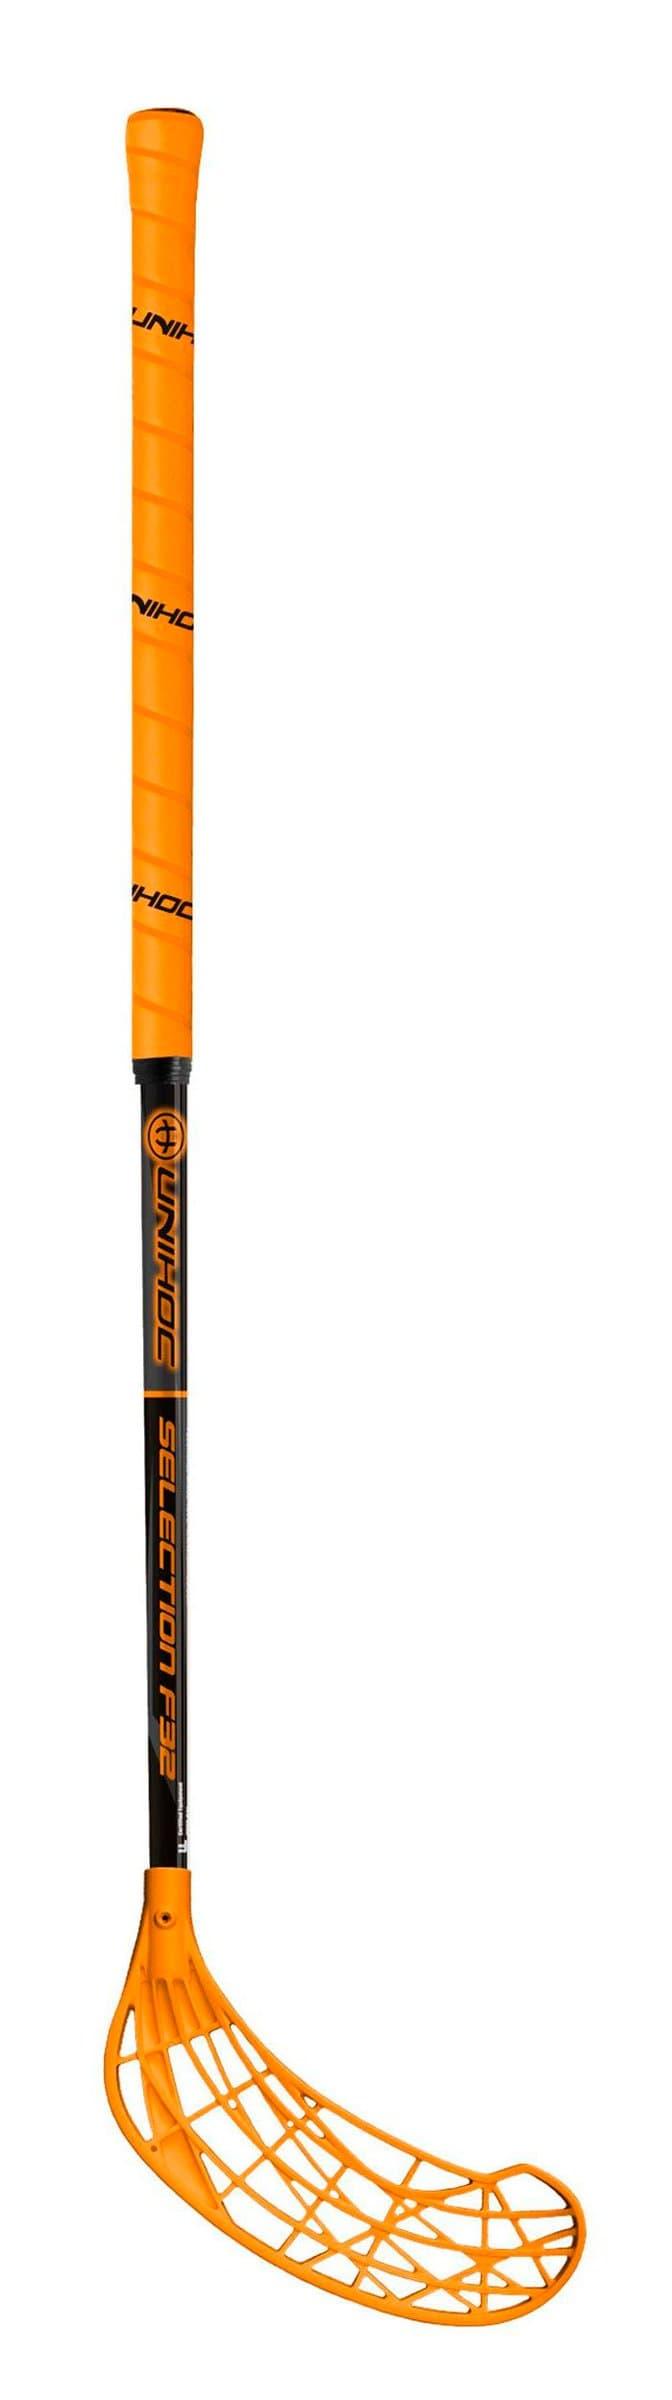 Unihoc Selection F32 inkl. Ace Blade Junior-Stock 87 cm